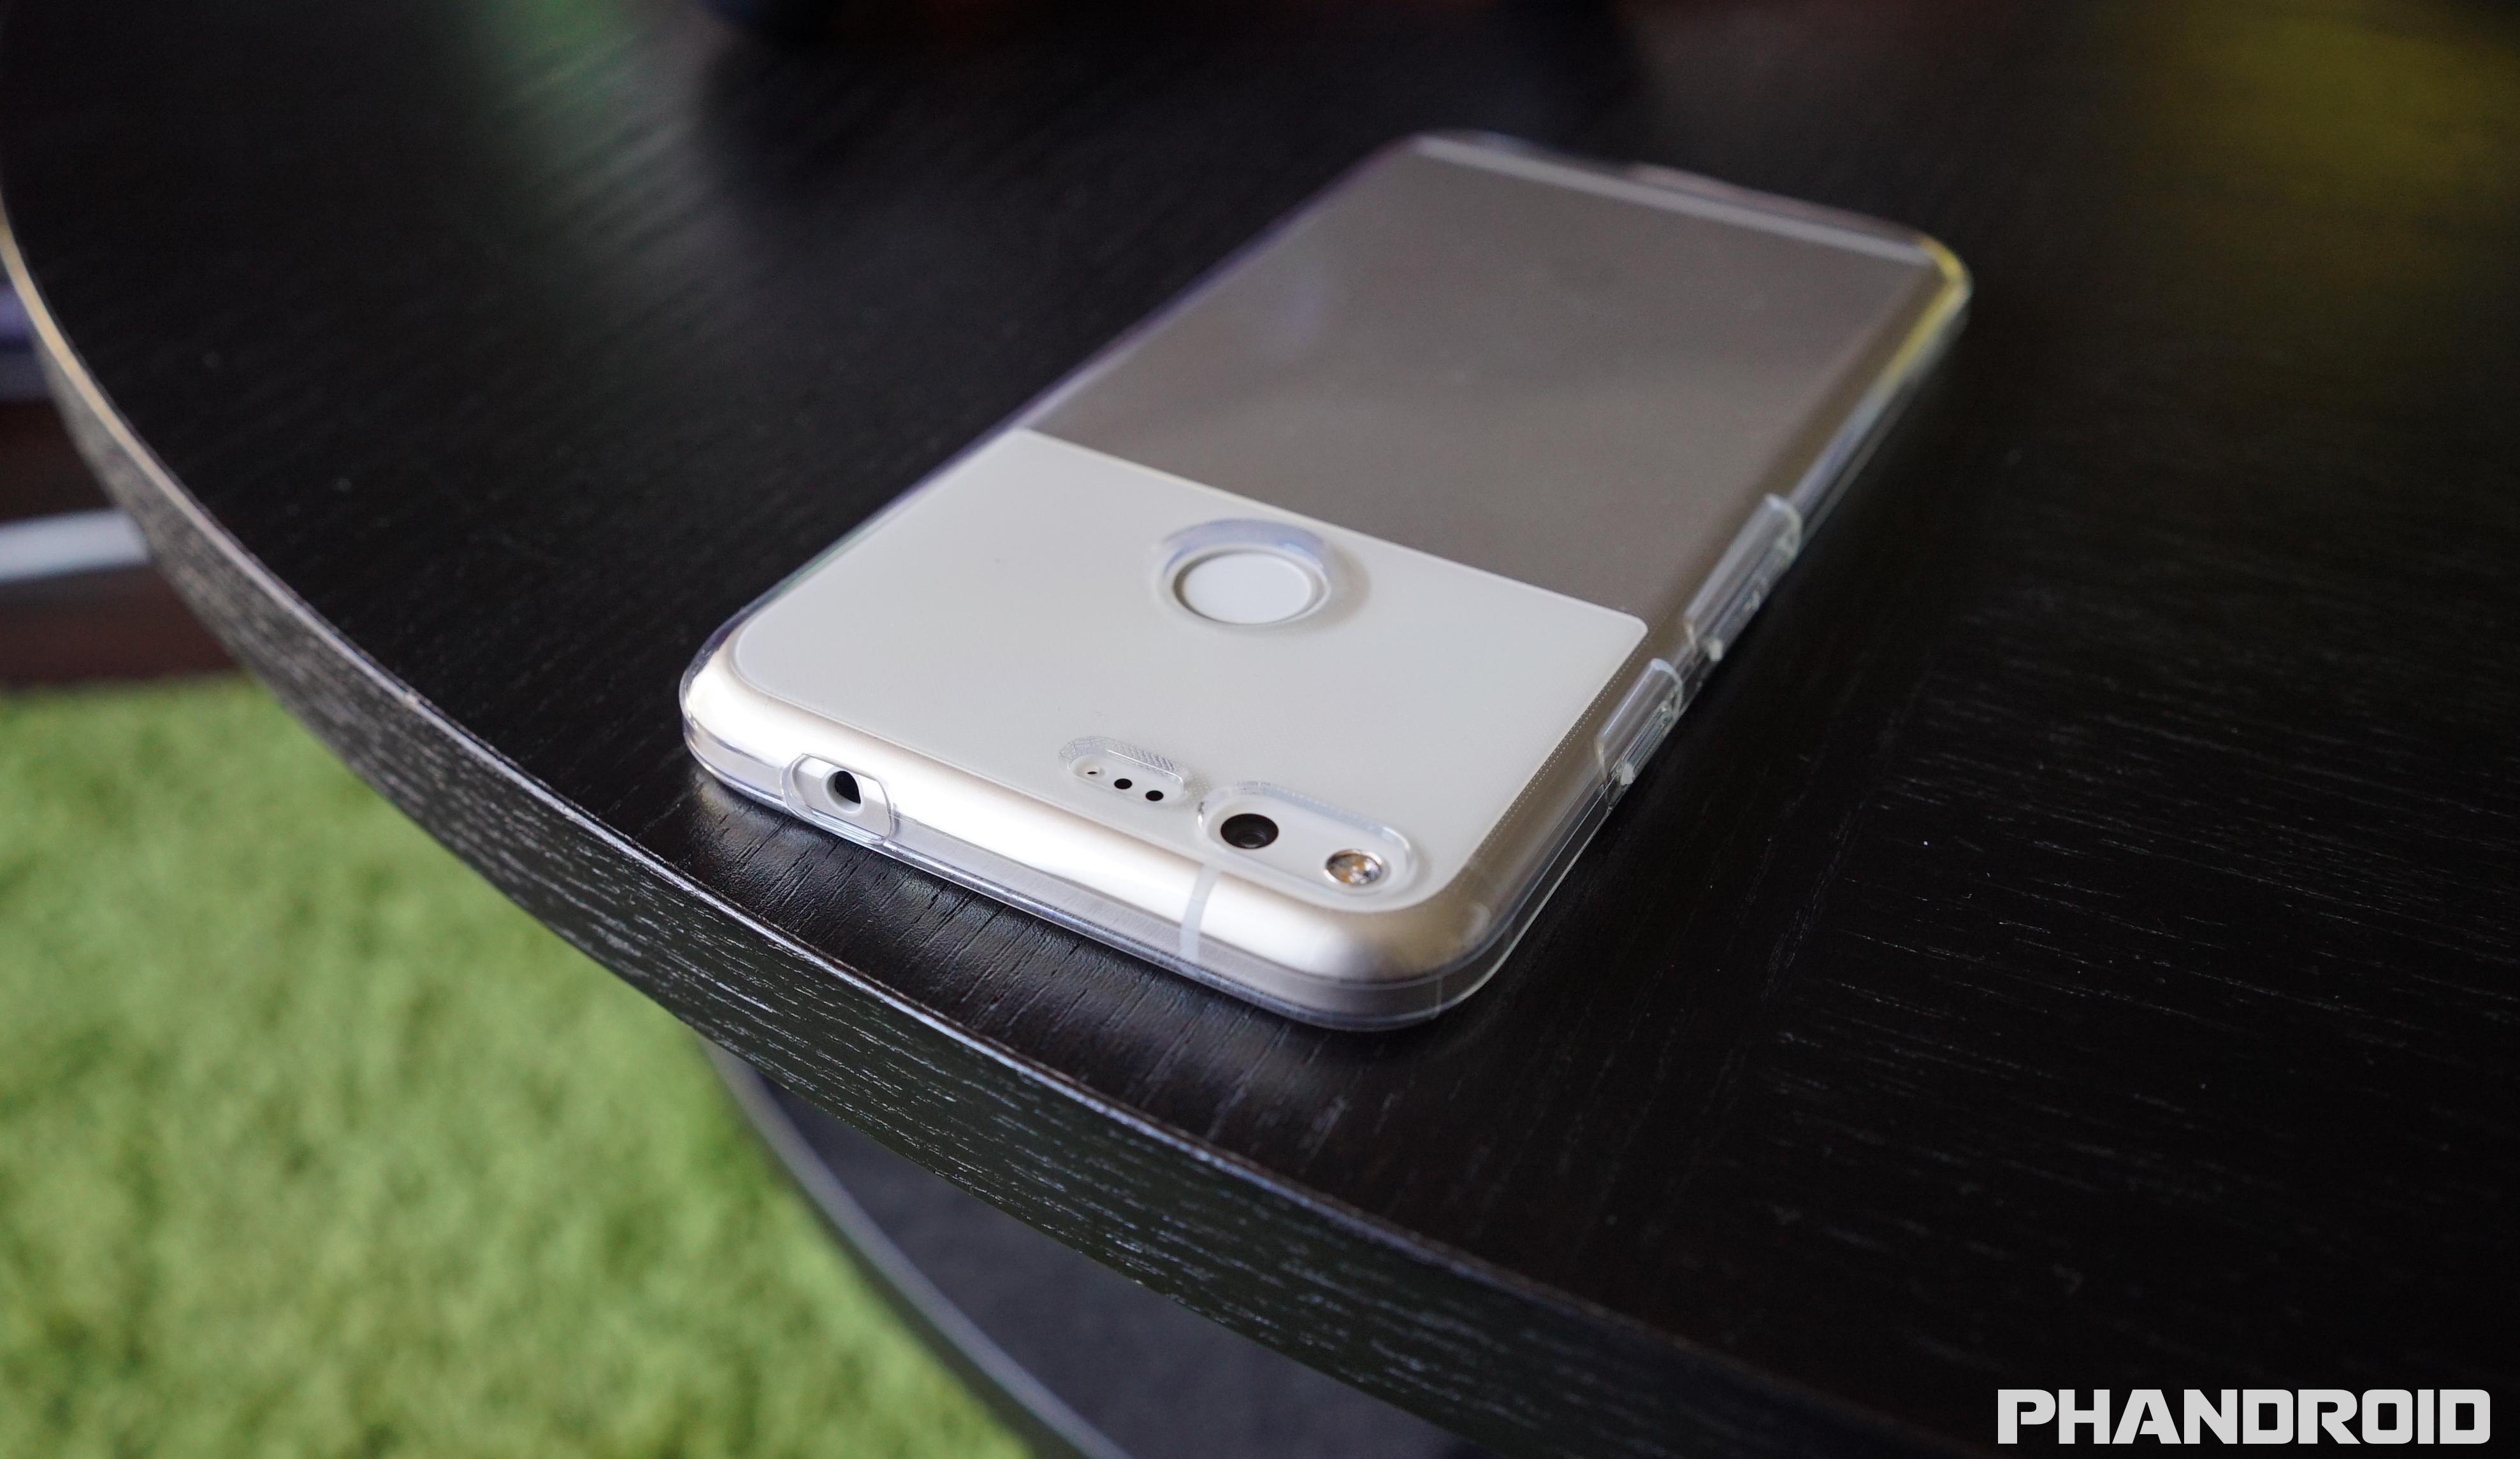 best website 1a46a 396e1 Hands-on: Spigen's entire case lineup for the Google Pixel [VIDEO]